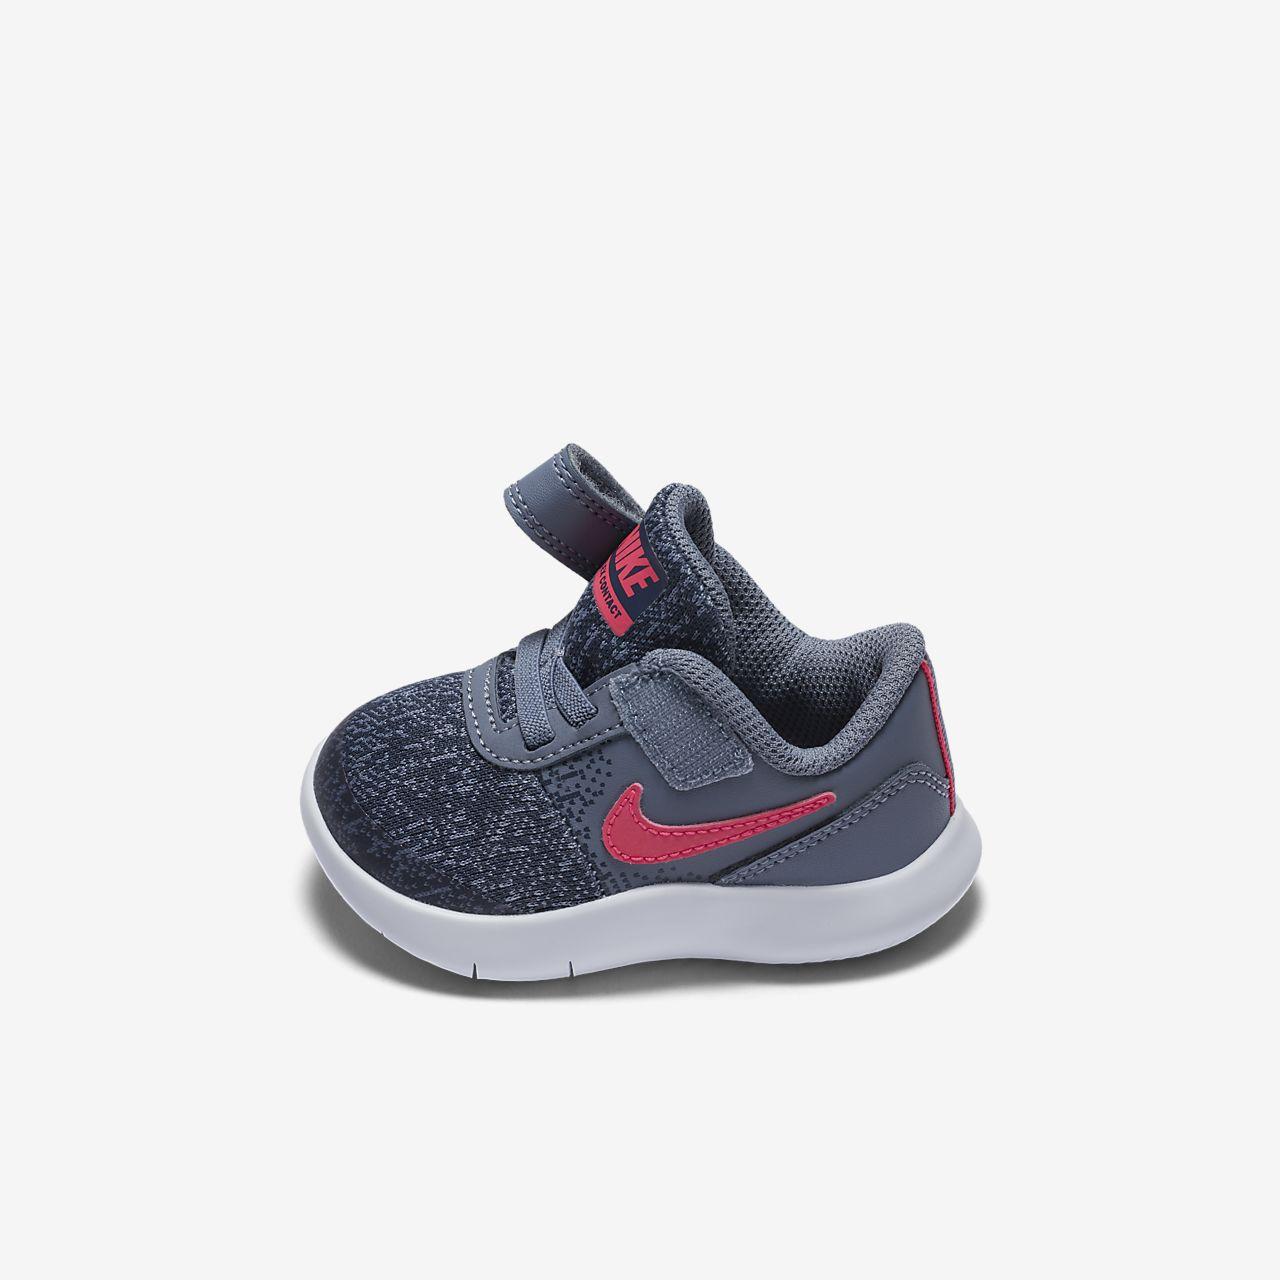 Nike Petite Sneakers Garçon Bleu, 27